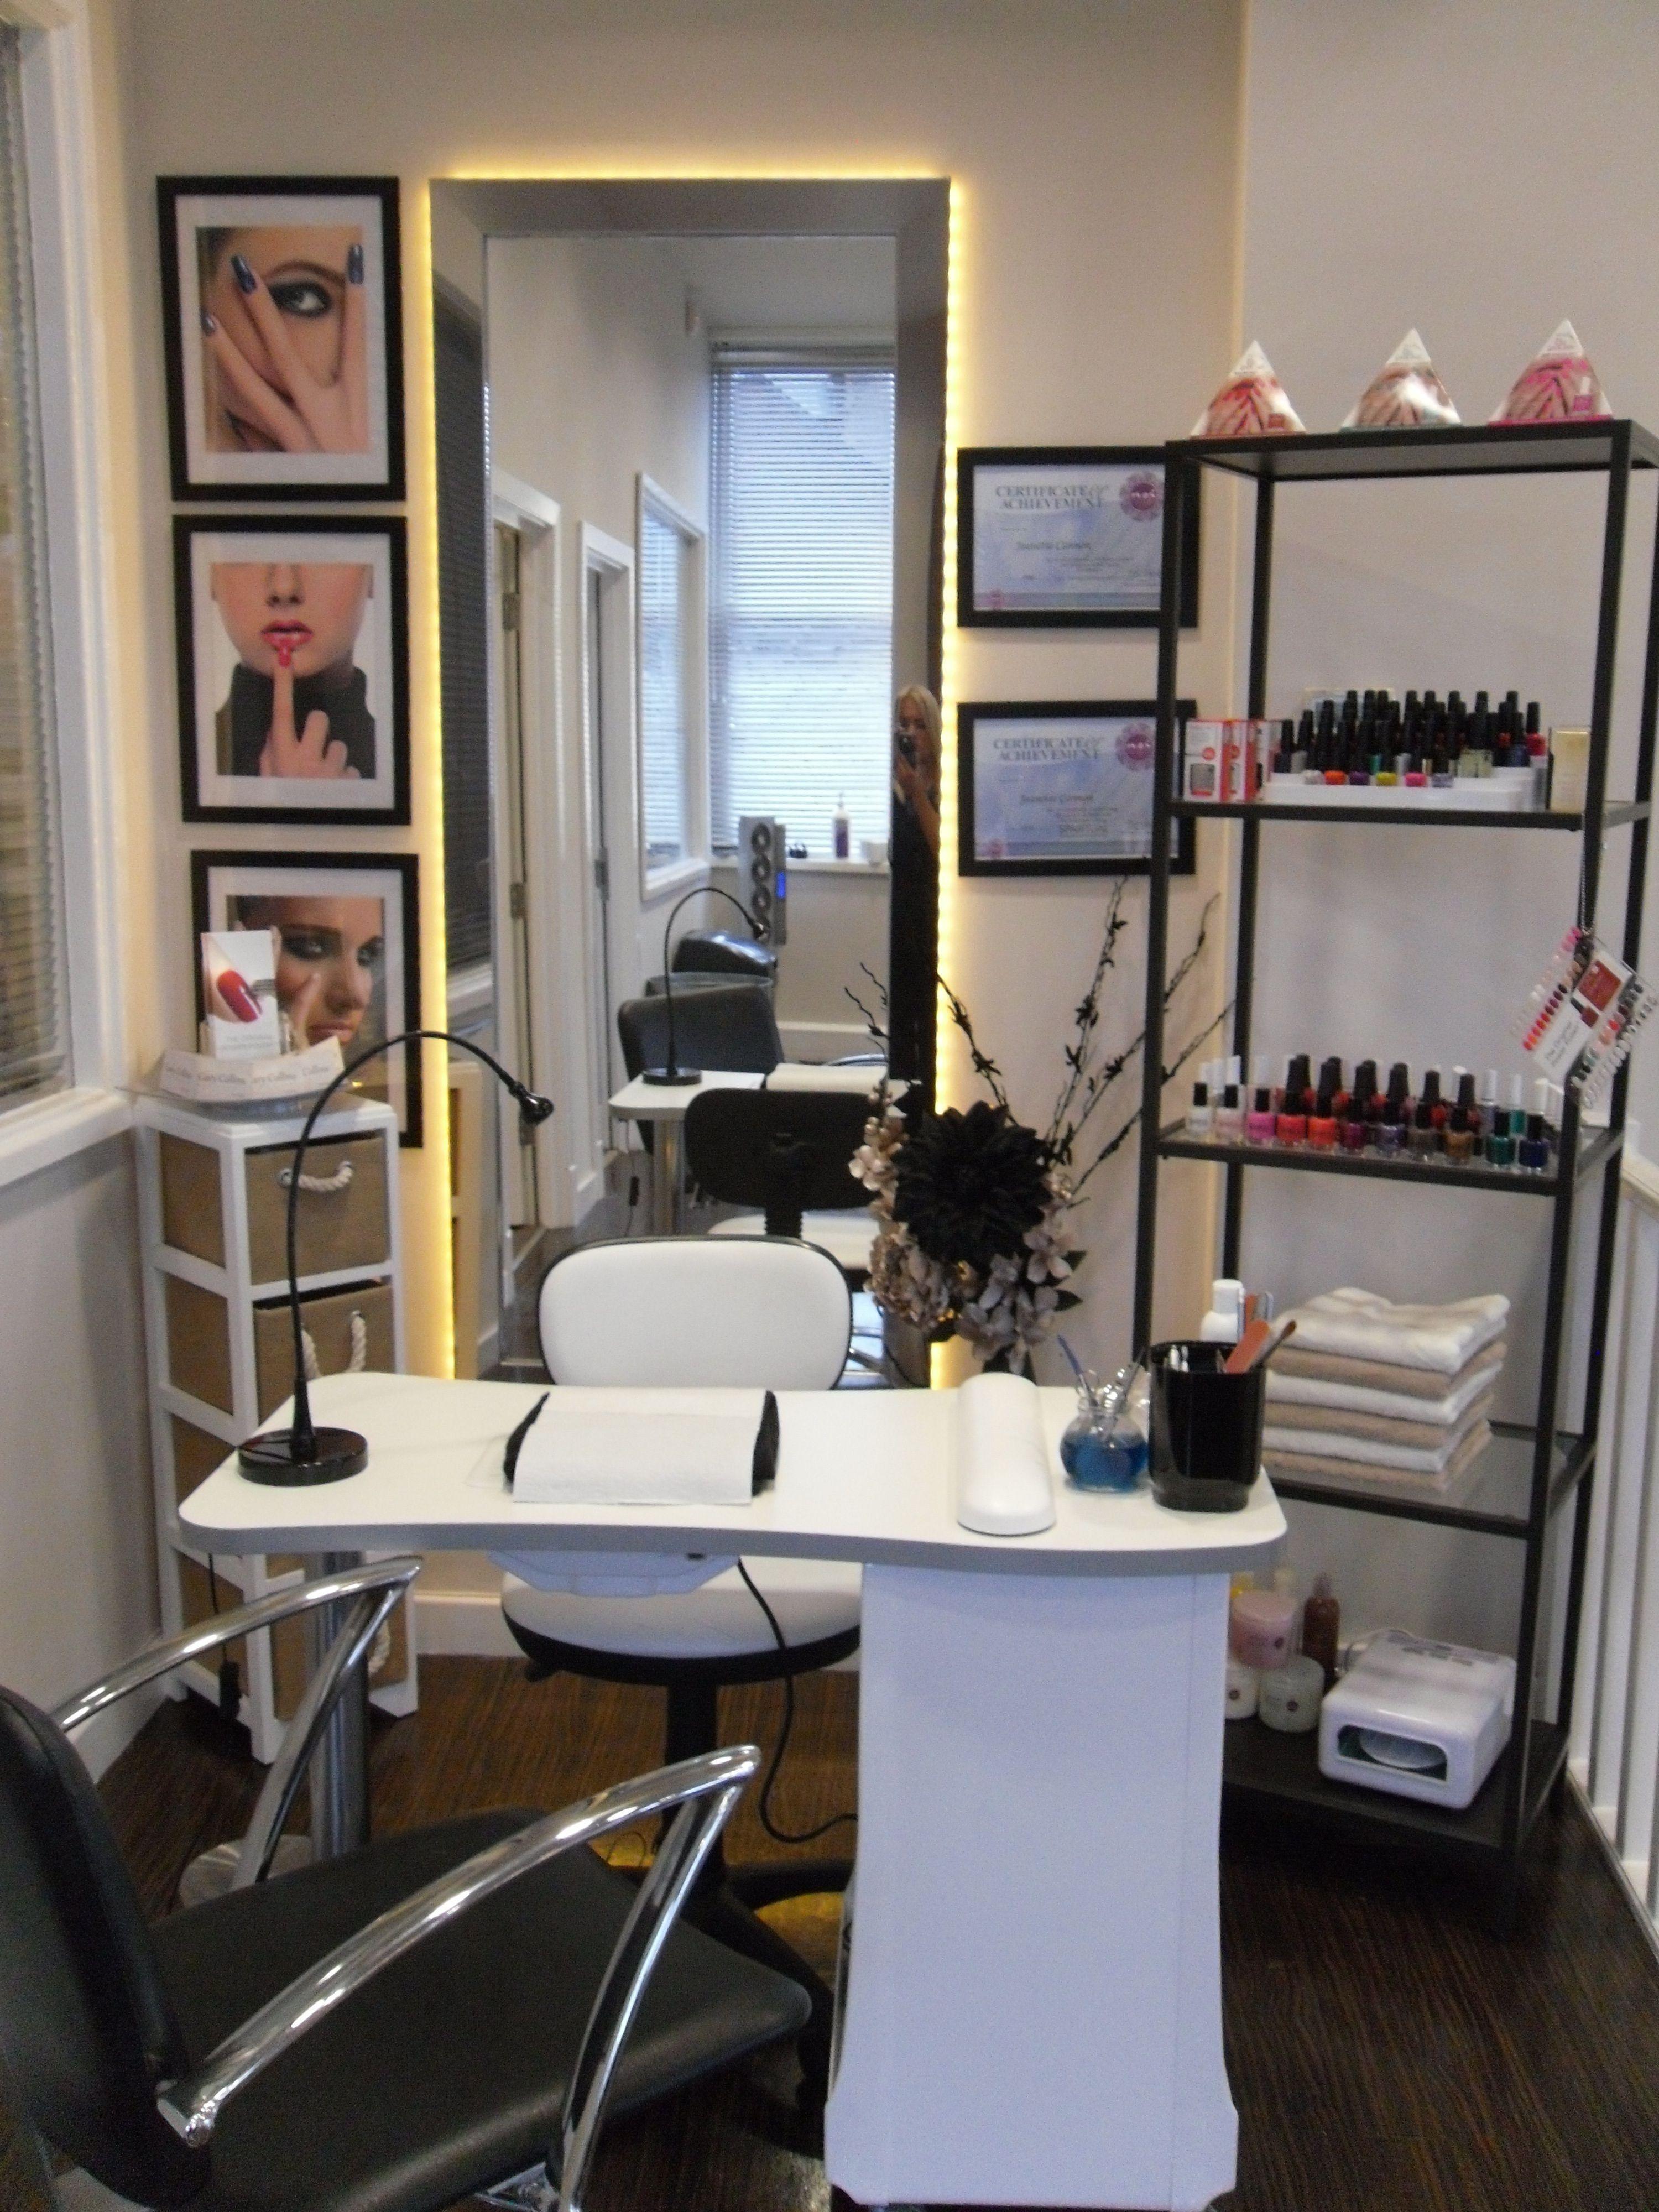 Imagen relacionada   Salon de uñas, Sala de uñas ...